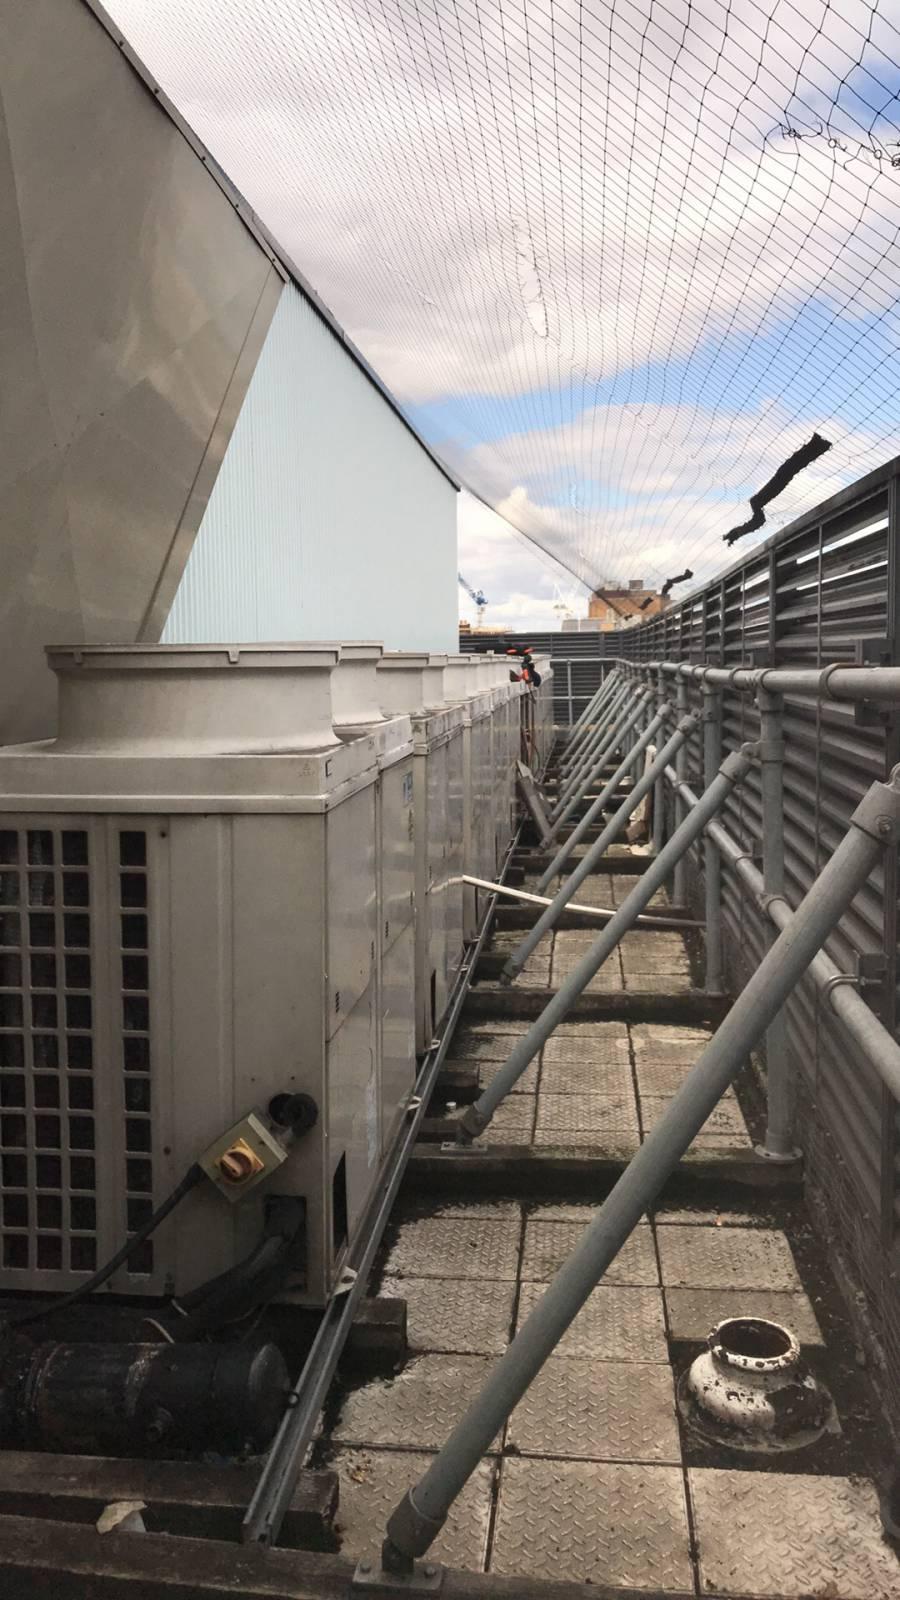 air-conditioning-london-air-conditioning-maintenance-london